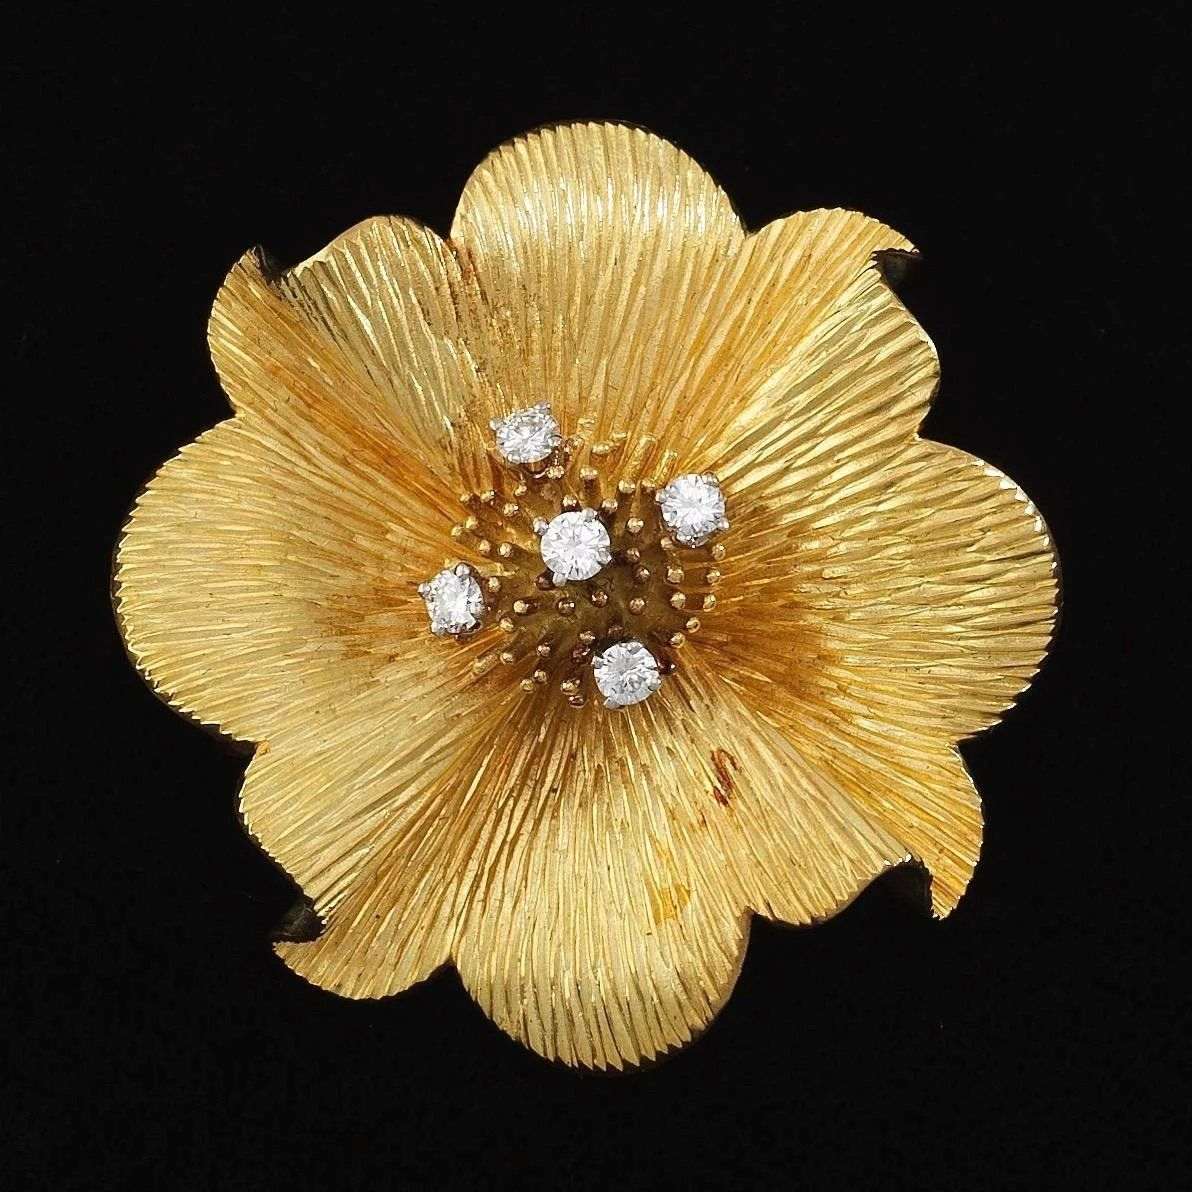 3c18a2d1567ac Stunning Tiffany & Co. 18k Gold Blossom Dogwood Flower 0.50 ct G VS ...